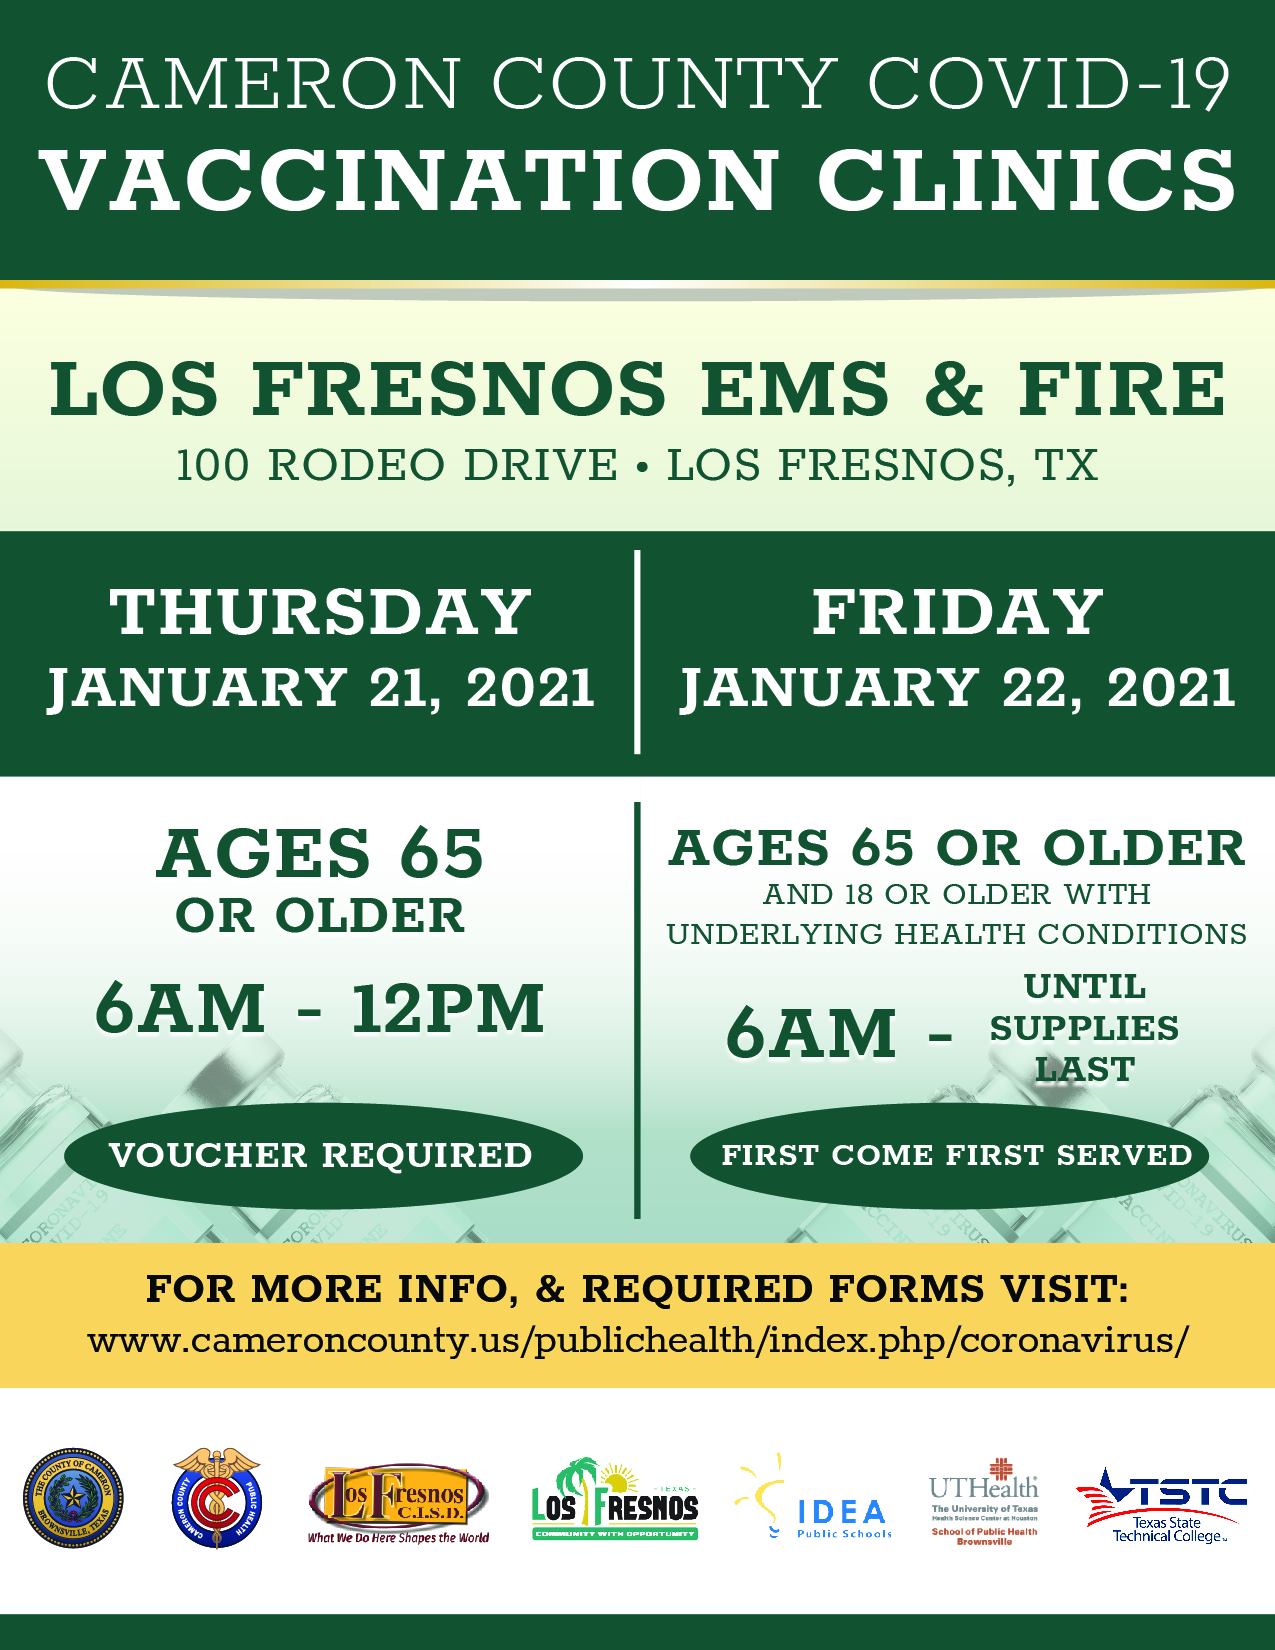 Cameron County Covid-19 Vaccination Clinic